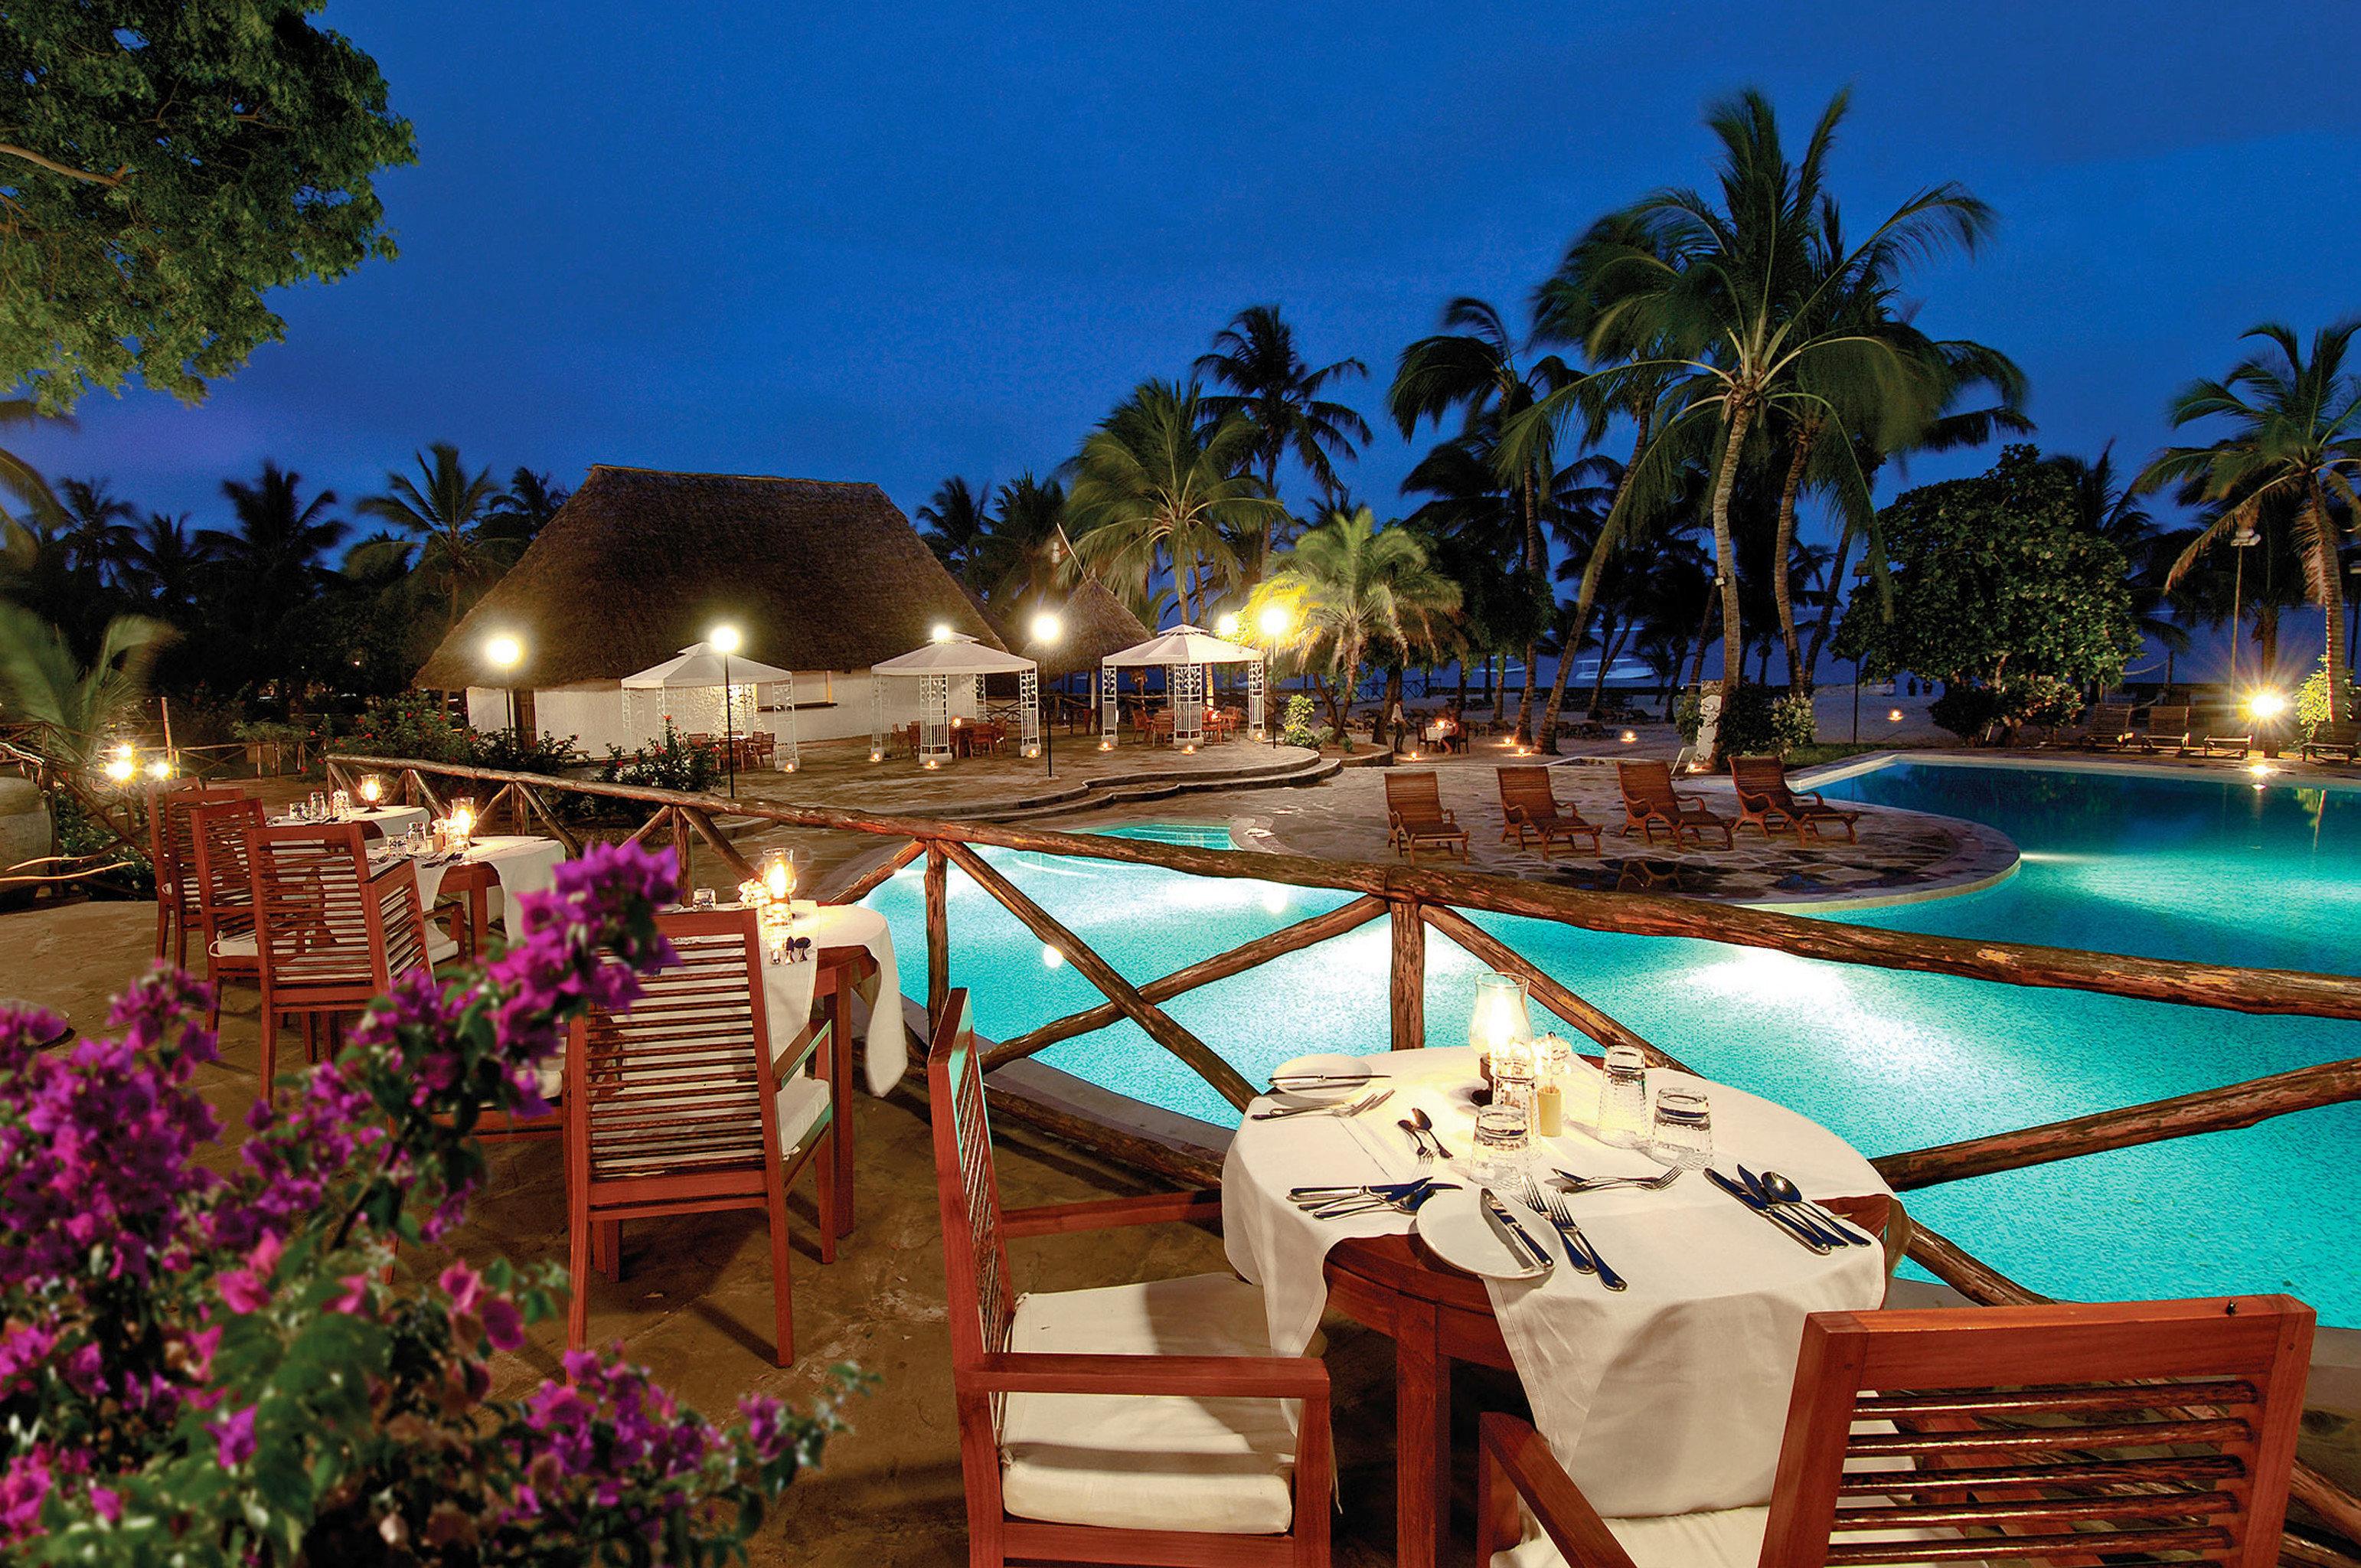 Dining Drink Eat Nightlife Play Pool Resort tree water leisure swimming pool restaurant Villa caribbean palm colorful Garden